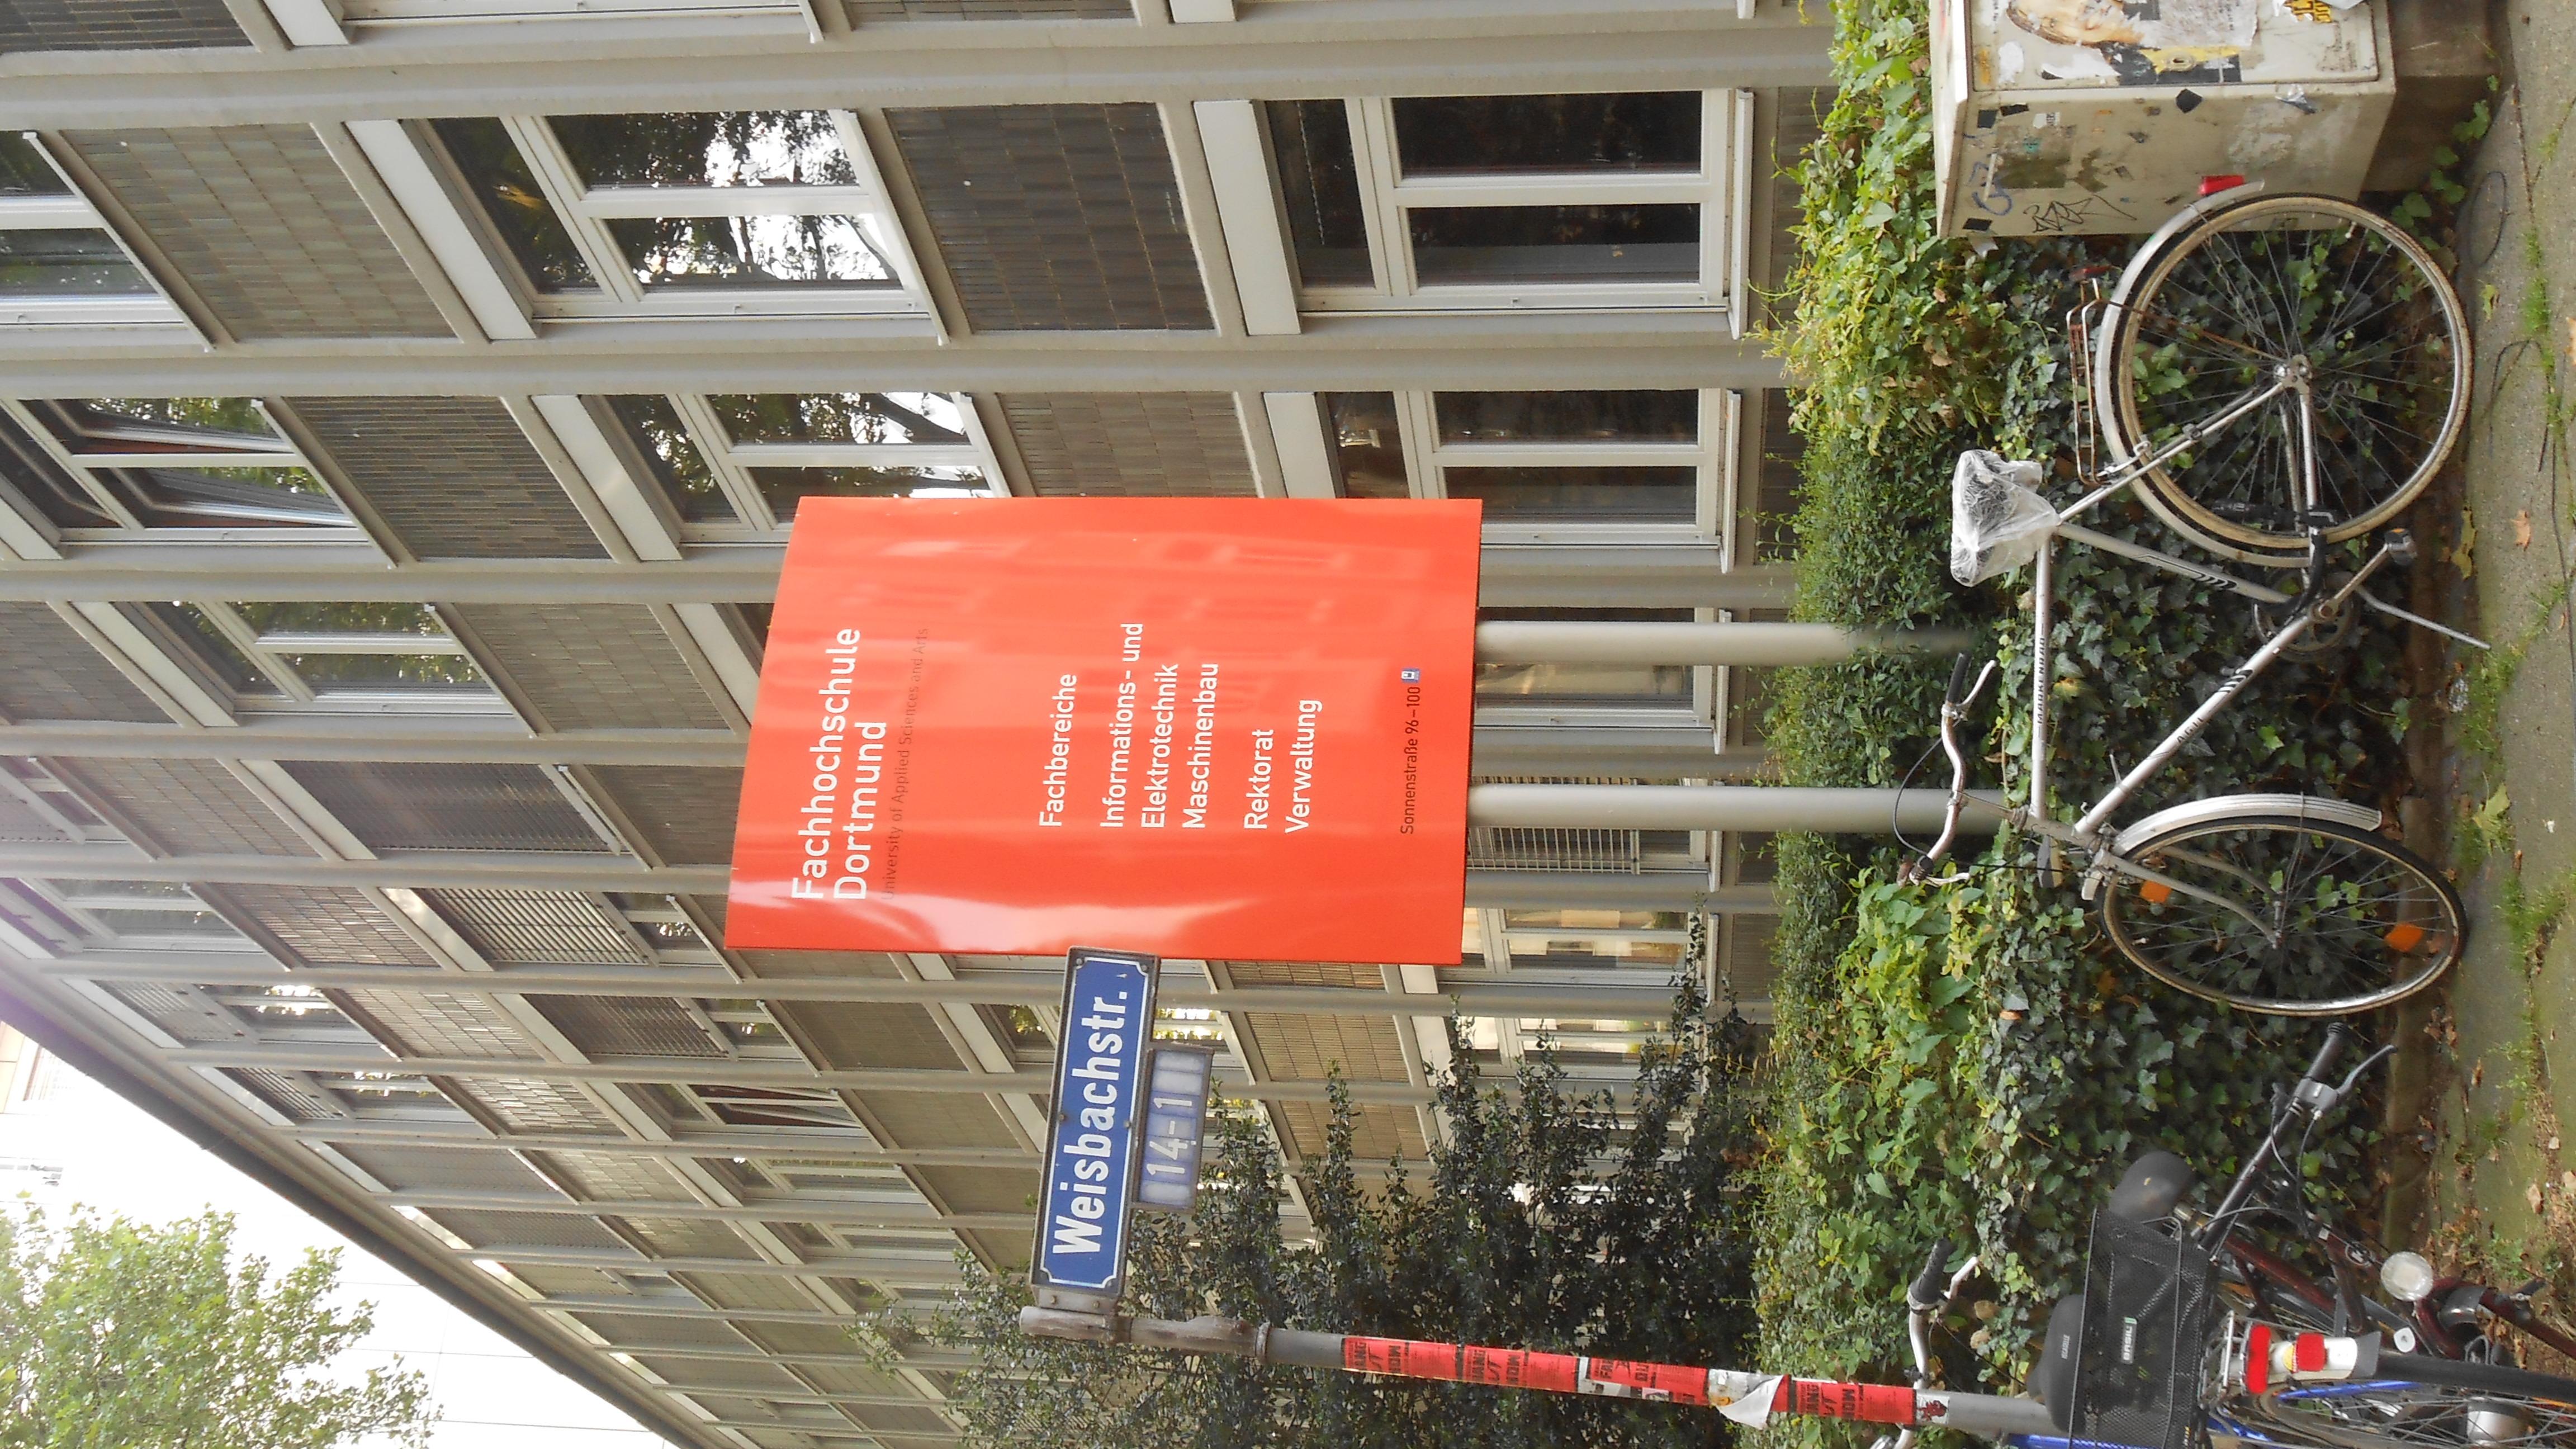 File Fachhochschule Dortmund Neuer Graben Jpg Wikimedia Commons